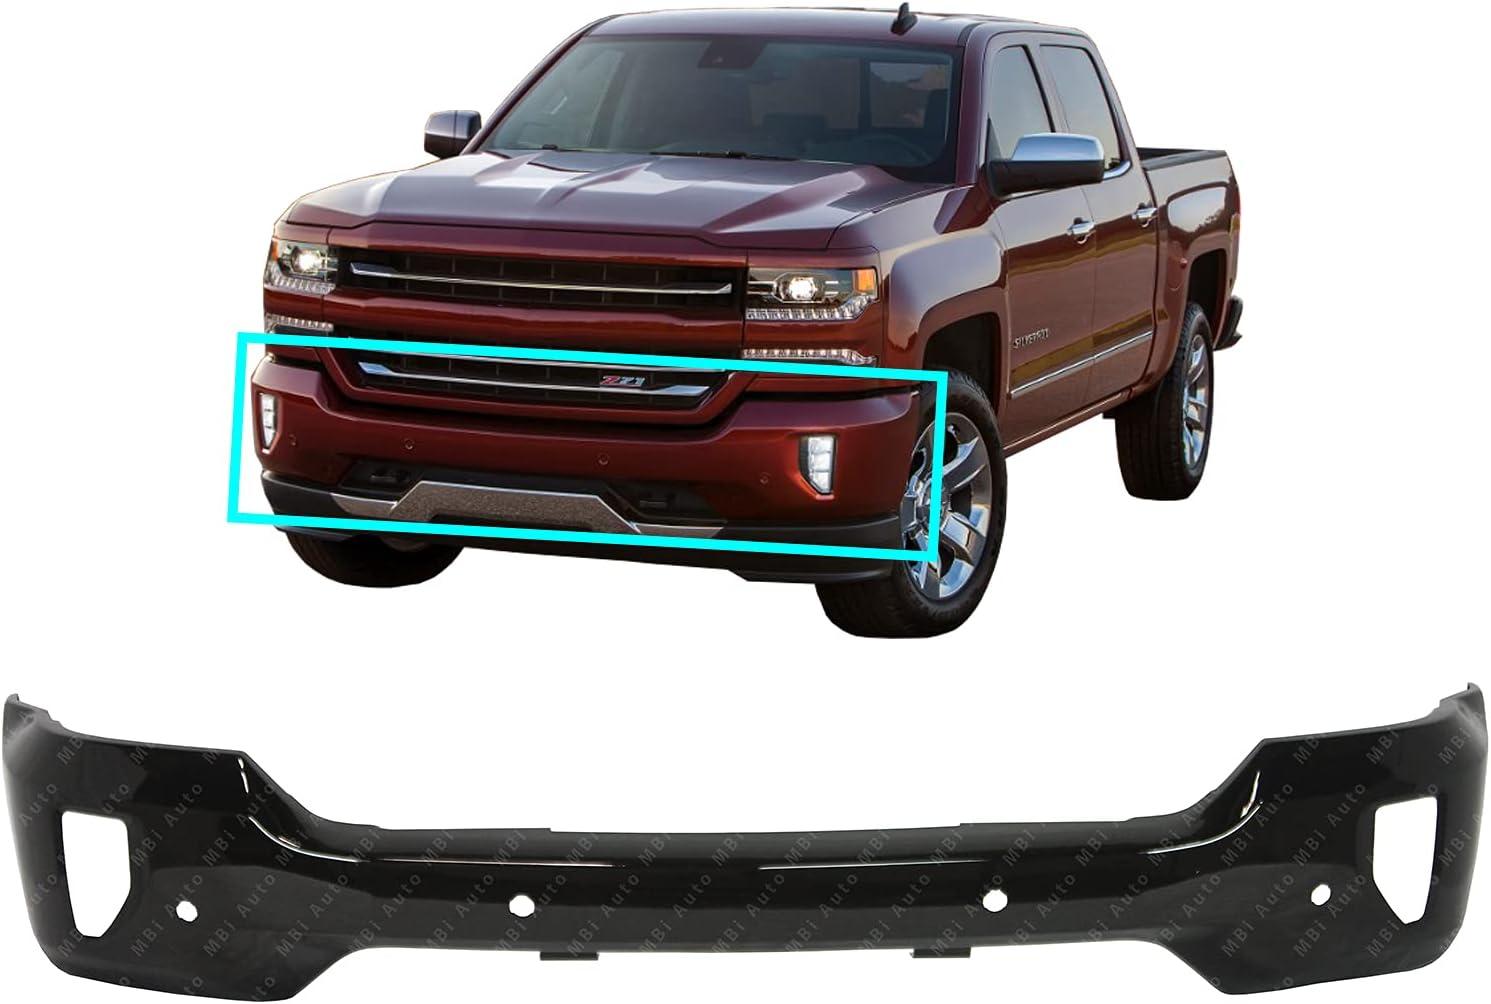 Amazon Com Bumpers That Deliver Primered Steel Front Bumper Face Bar Compatible With 2016 2018 Chevy Silverado 1500 W Fog Park Assist 16 18 Gm1002863 Automotive